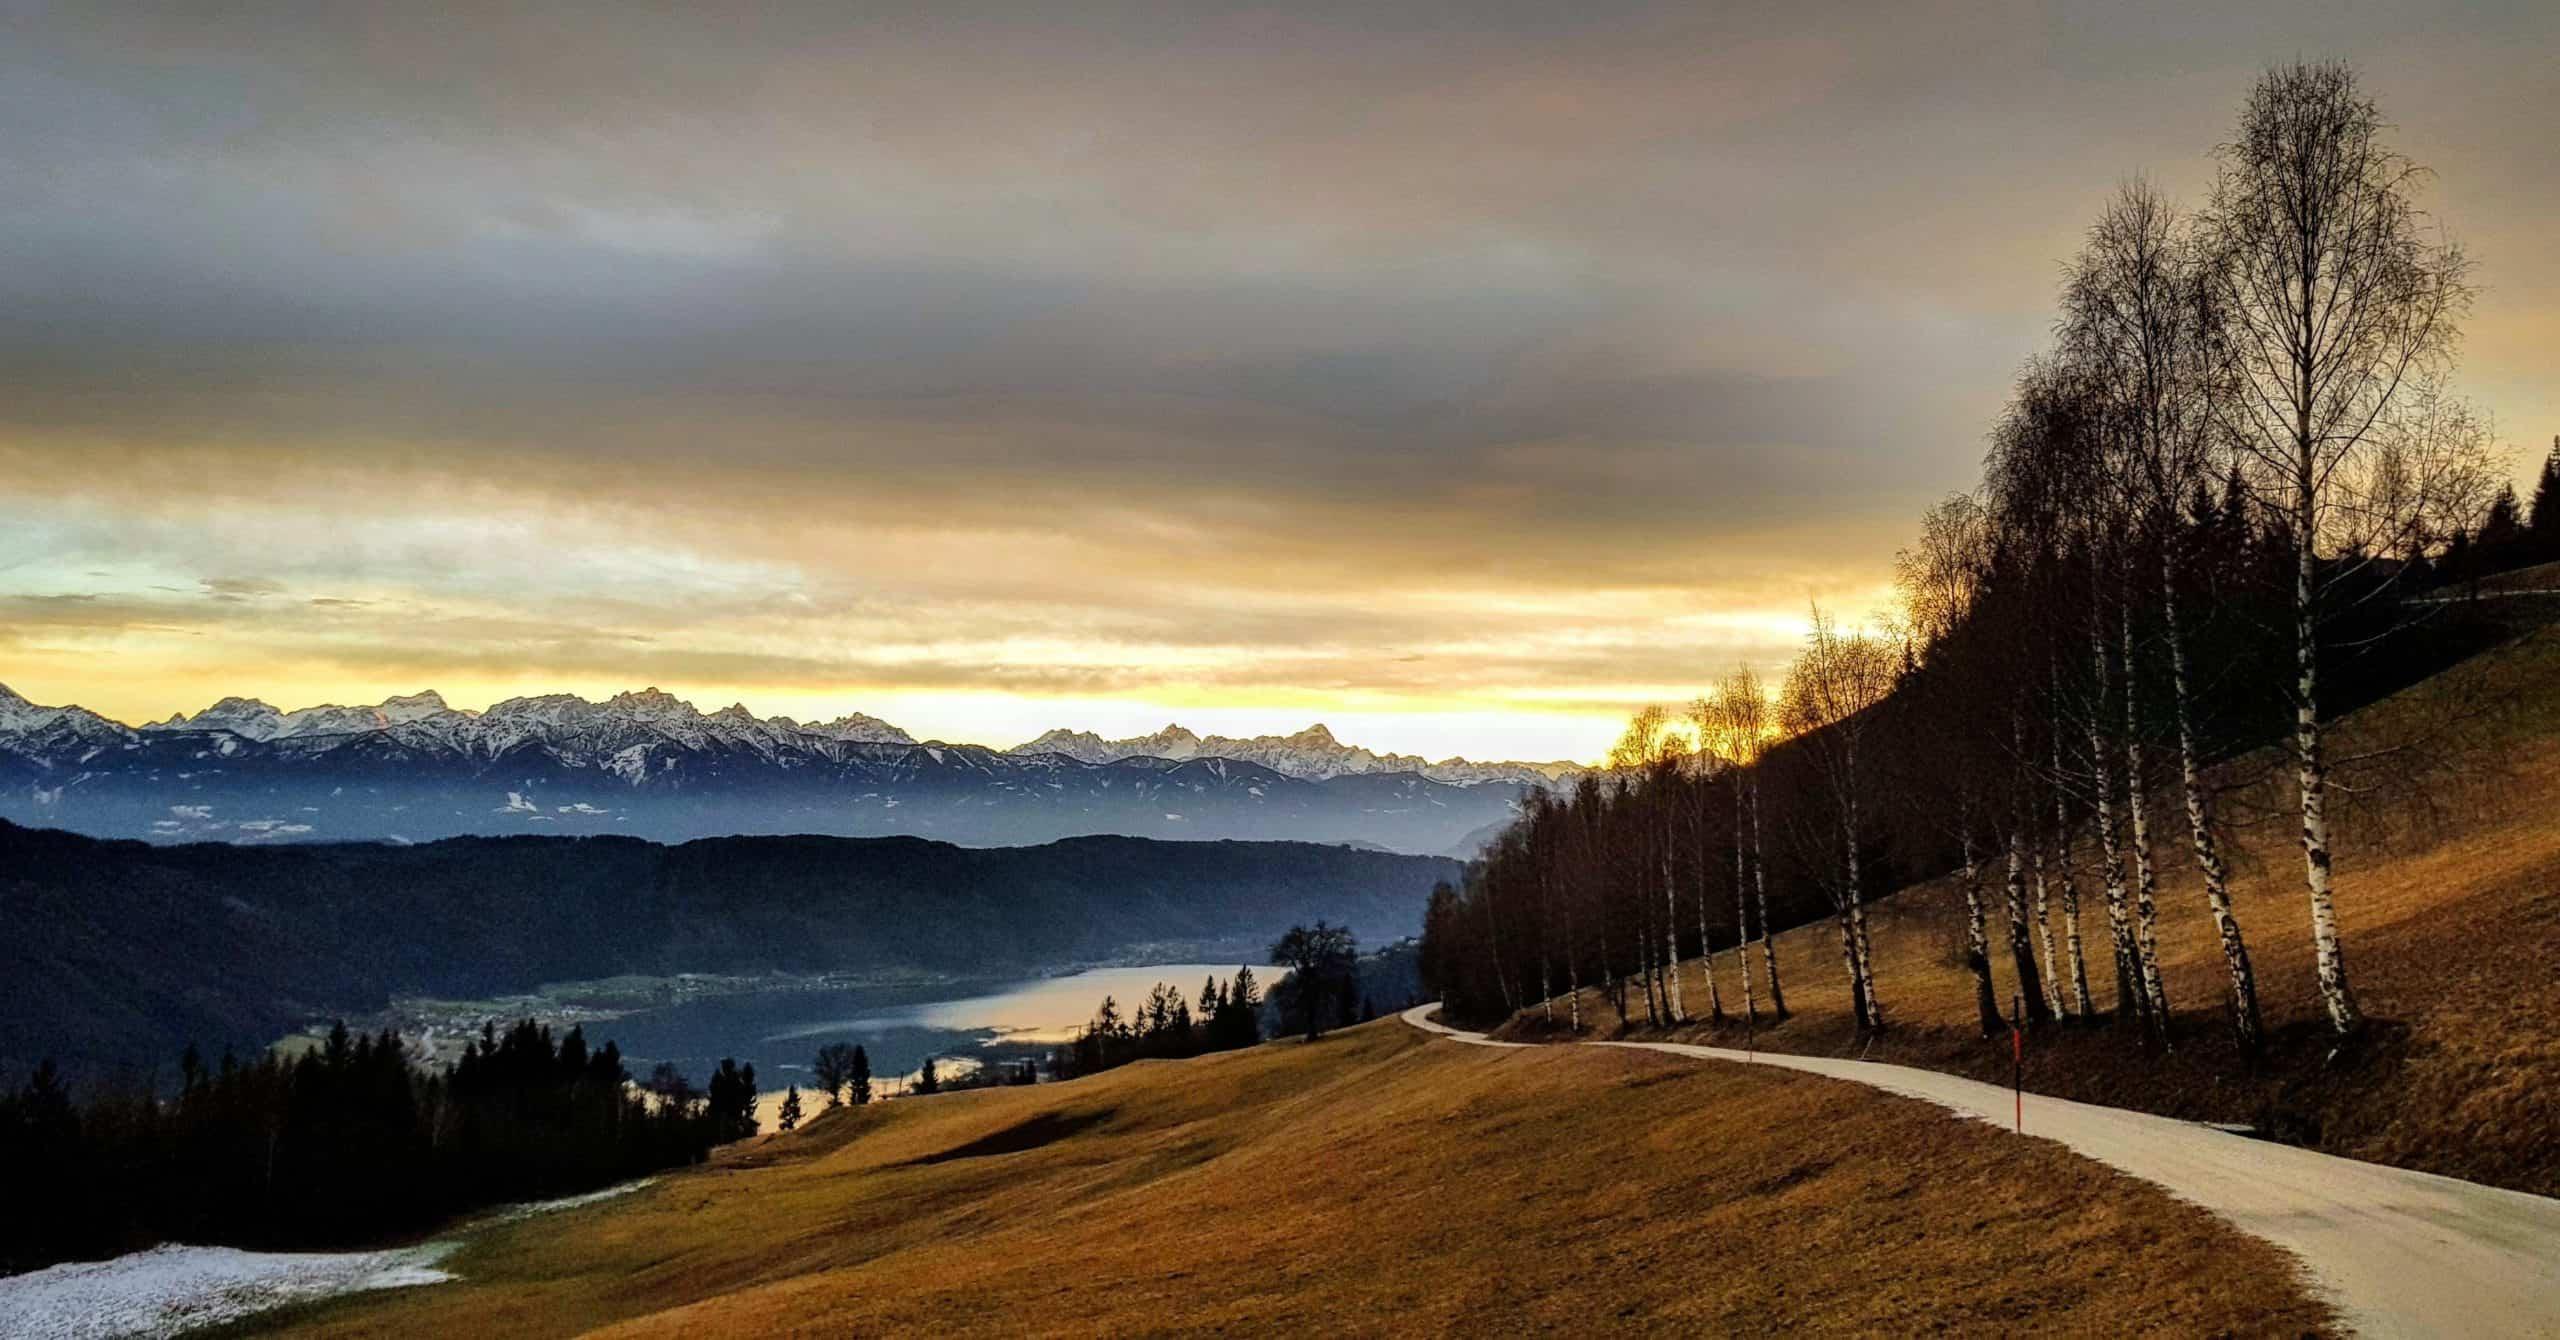 Wanderung im Winter am Ossiachberg am Ossiacher See in Villach Kärnten im Jänner ohne Schnee